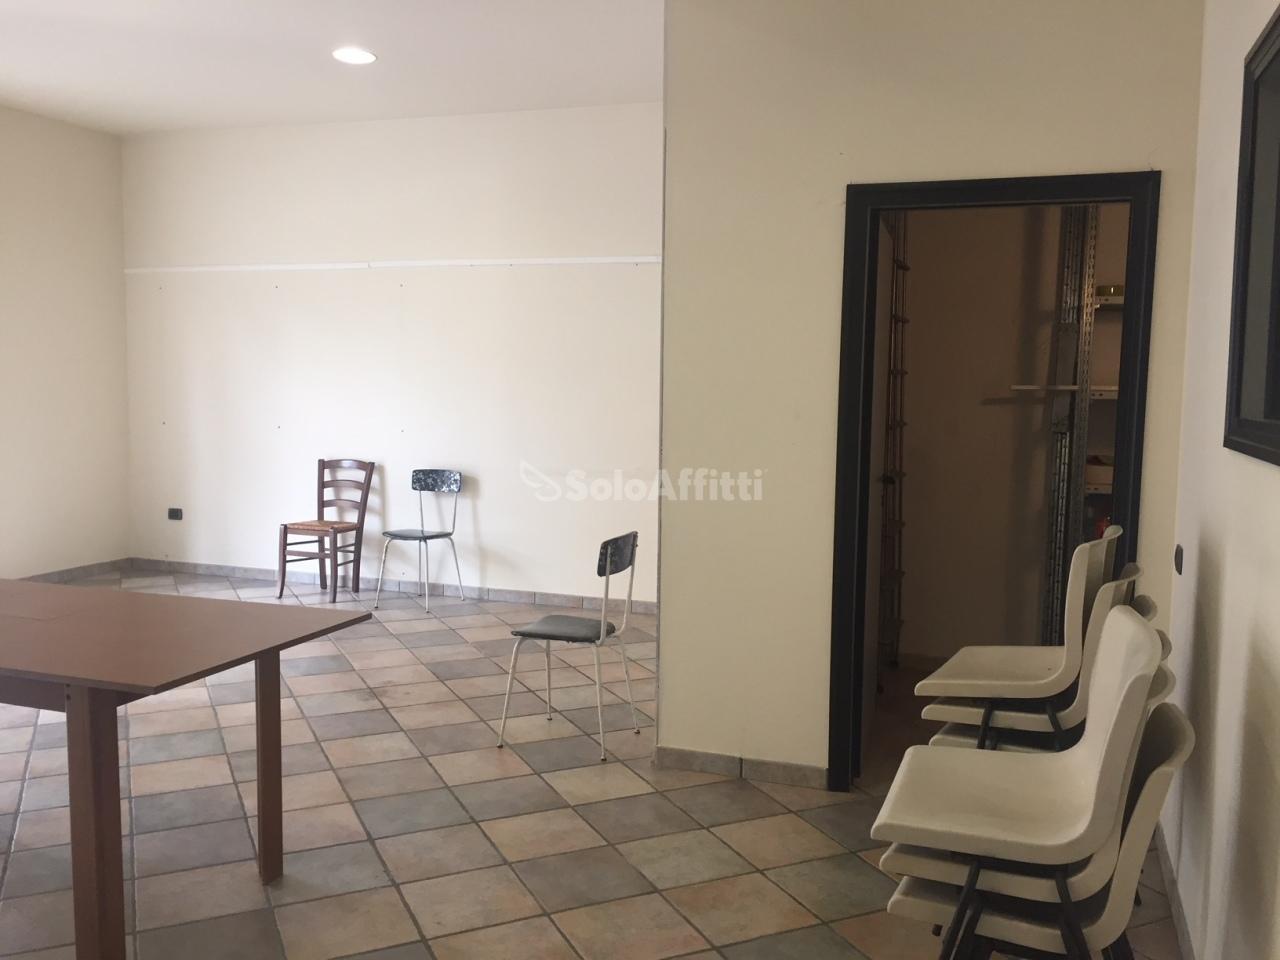 Fondo/negozio - 1 vetrina/luce a Macerata Rif. 9847196